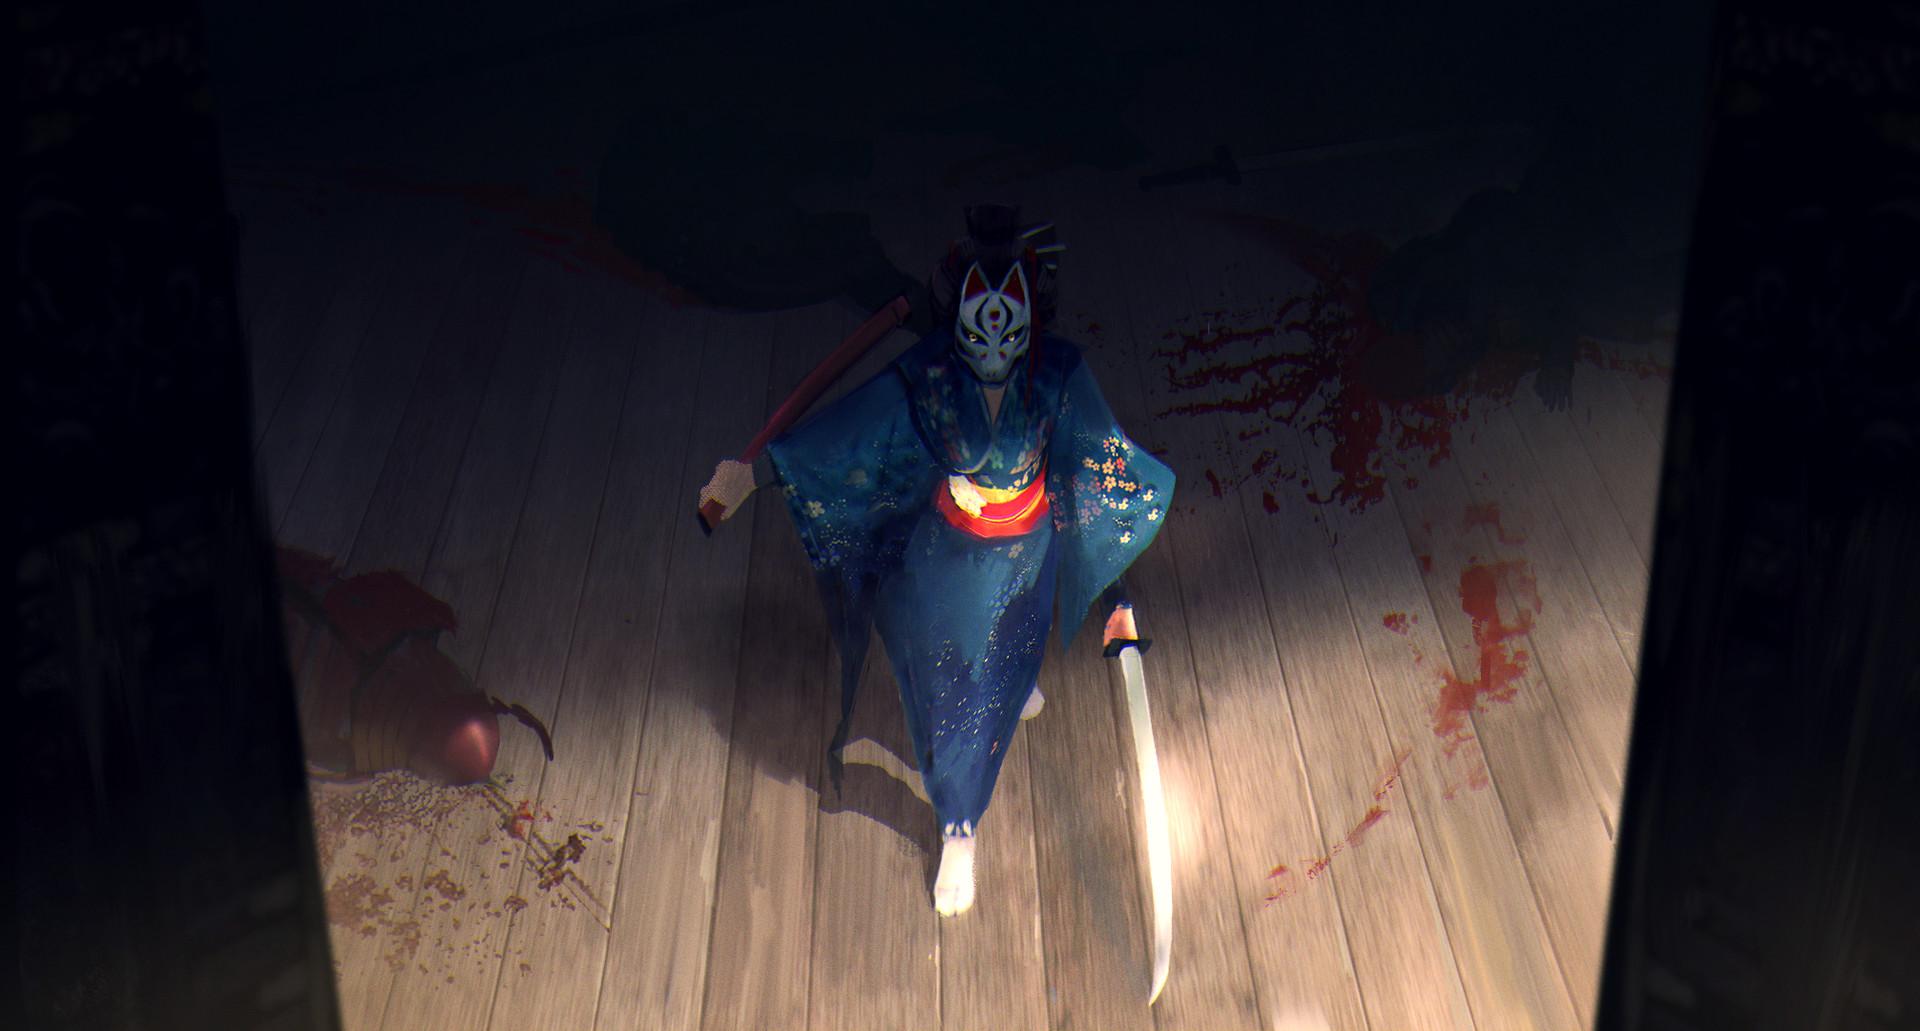 General 1920x1031 Japan fantasy art samurai armor weapon katana blood mask kimono Sangyeop Park high angle